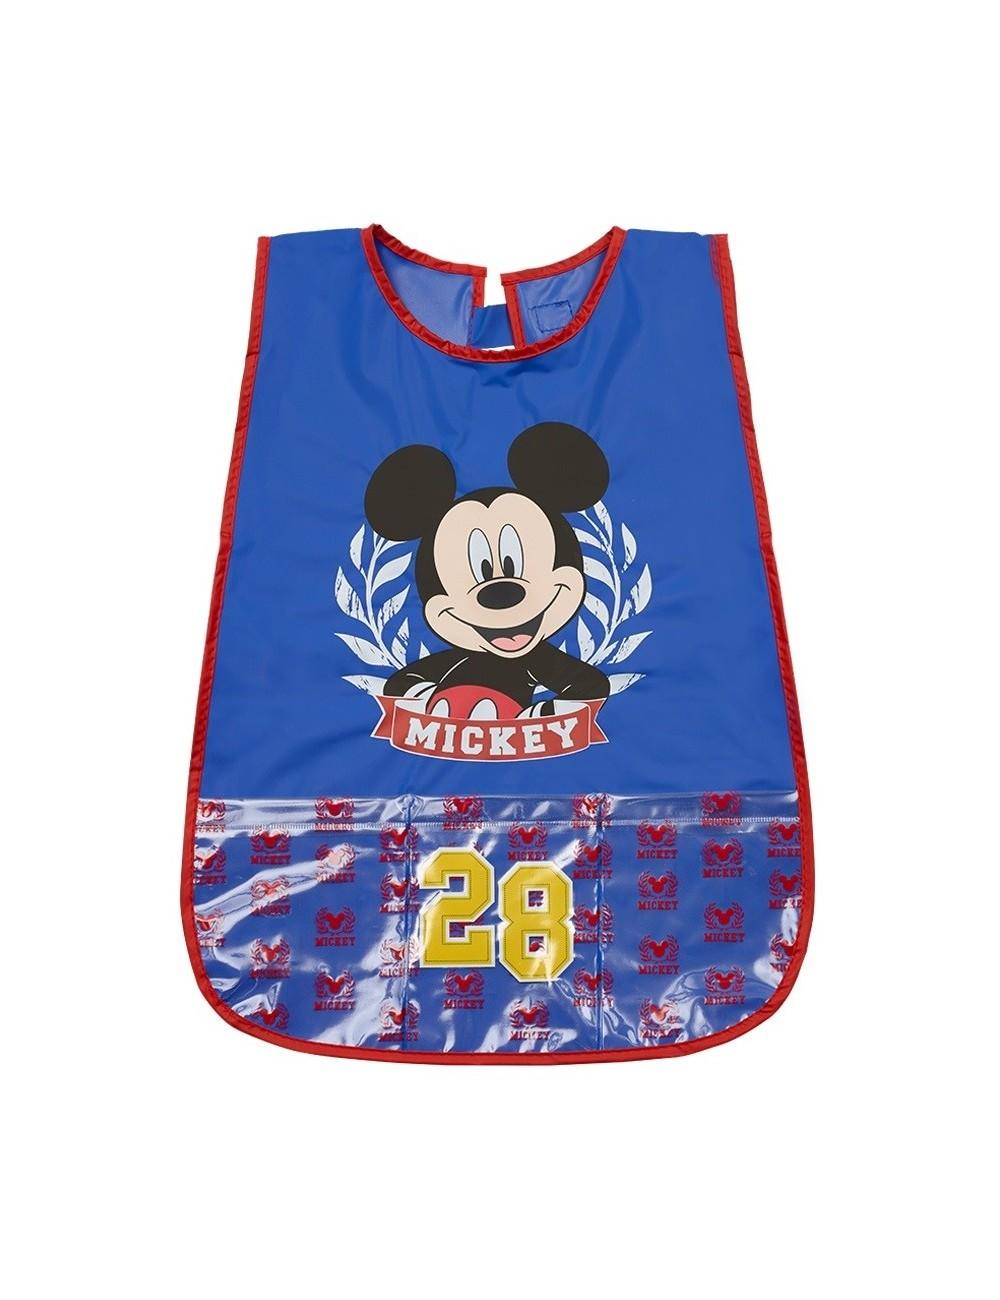 Sort protectie PVC, Mickey Mouse, albastru